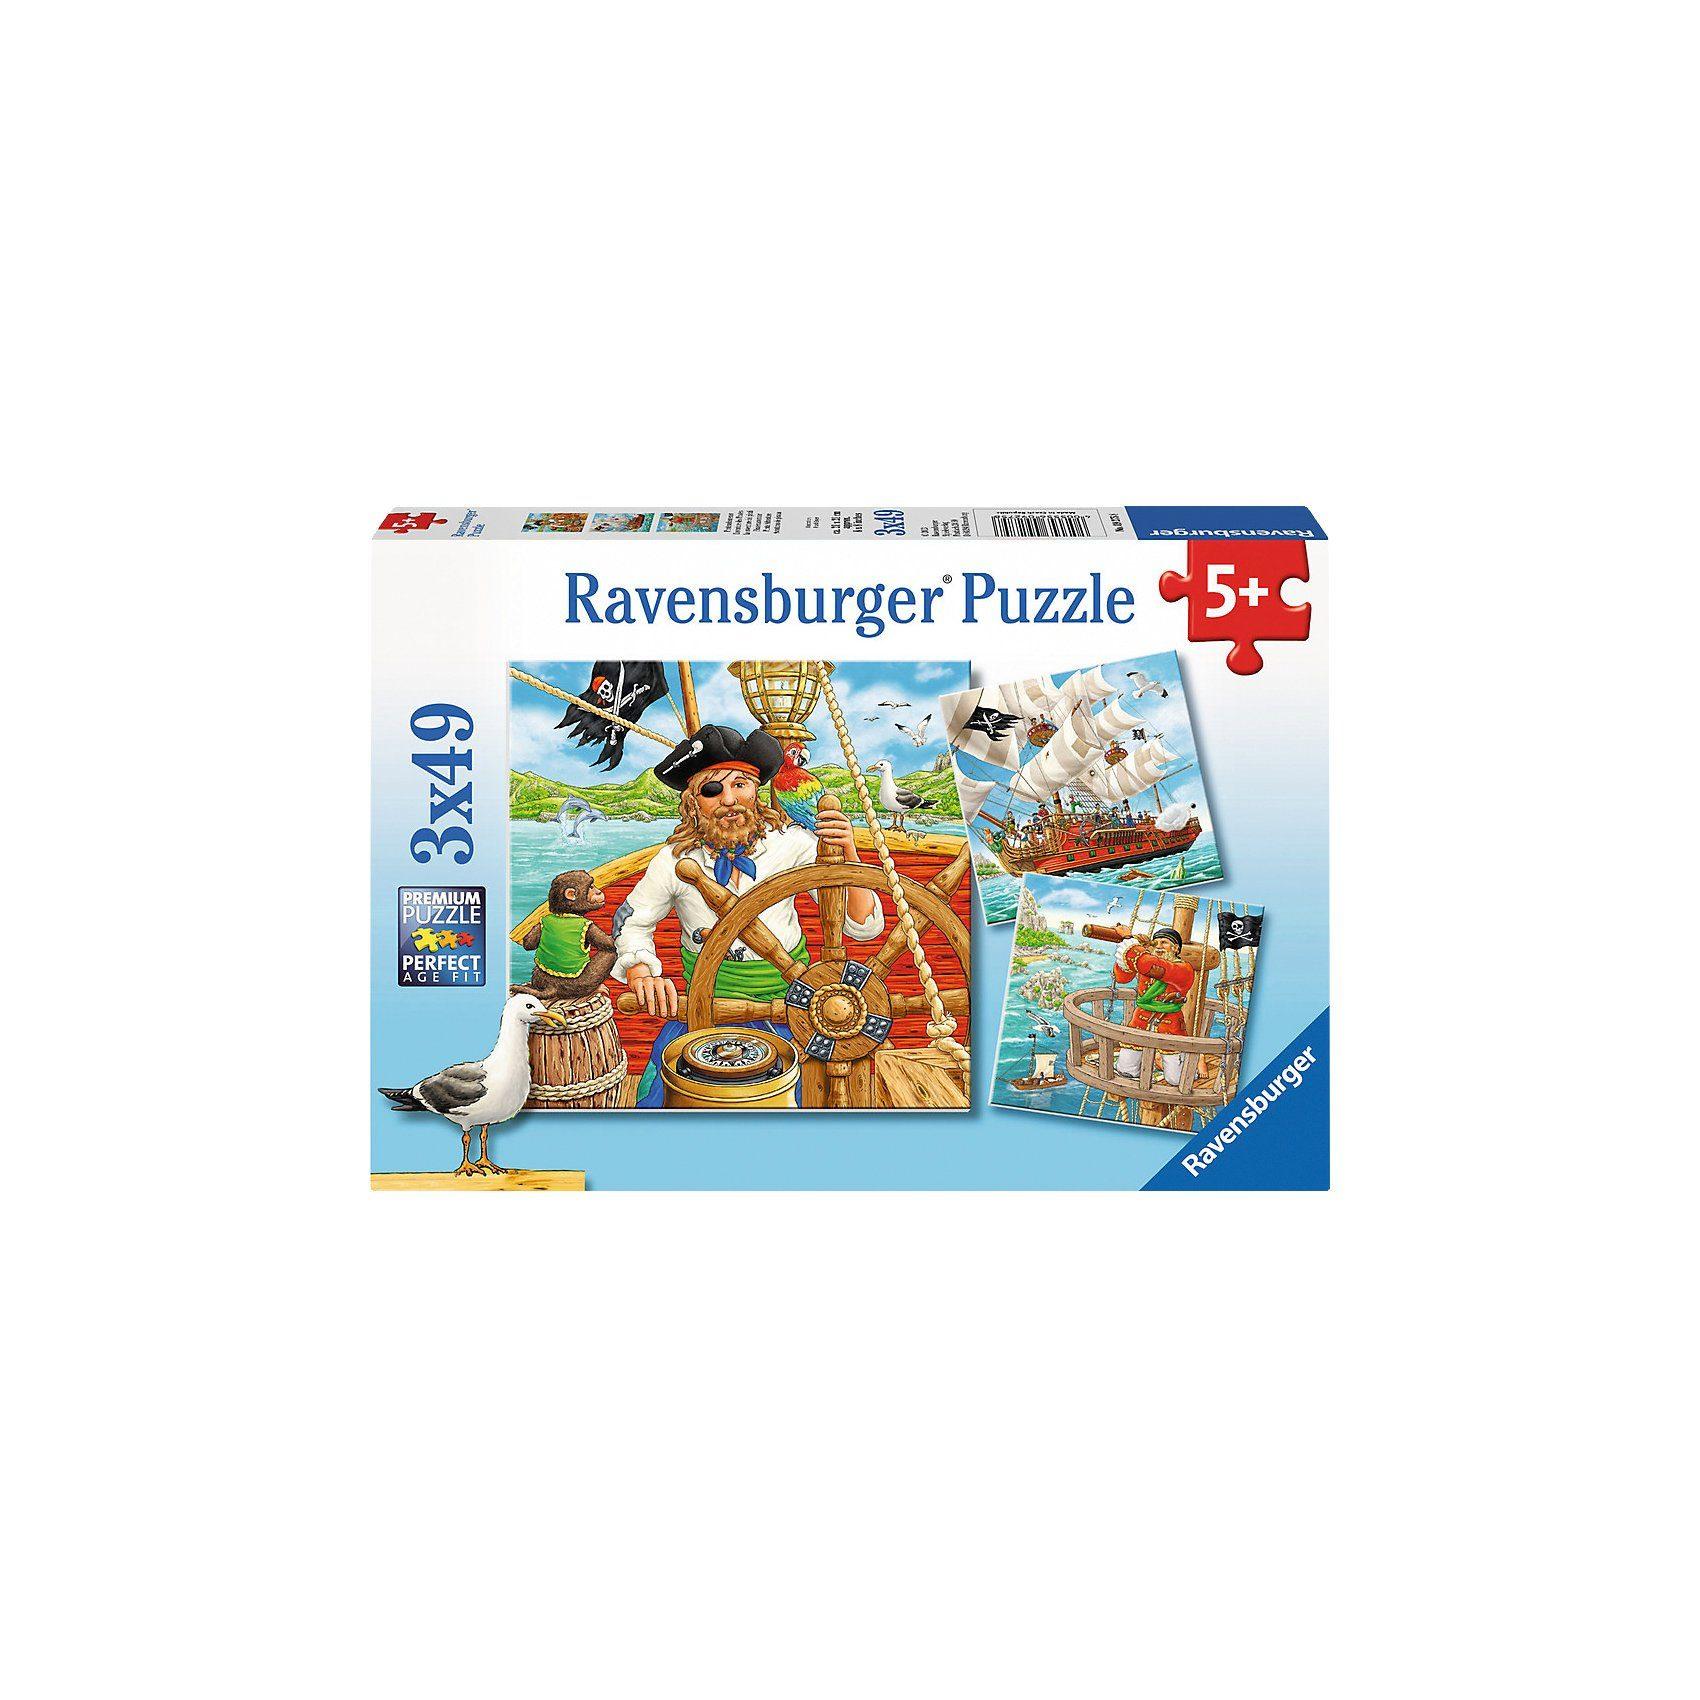 Ravensburger Puzzleset 3 x 49 Teile Piratenabenteuer